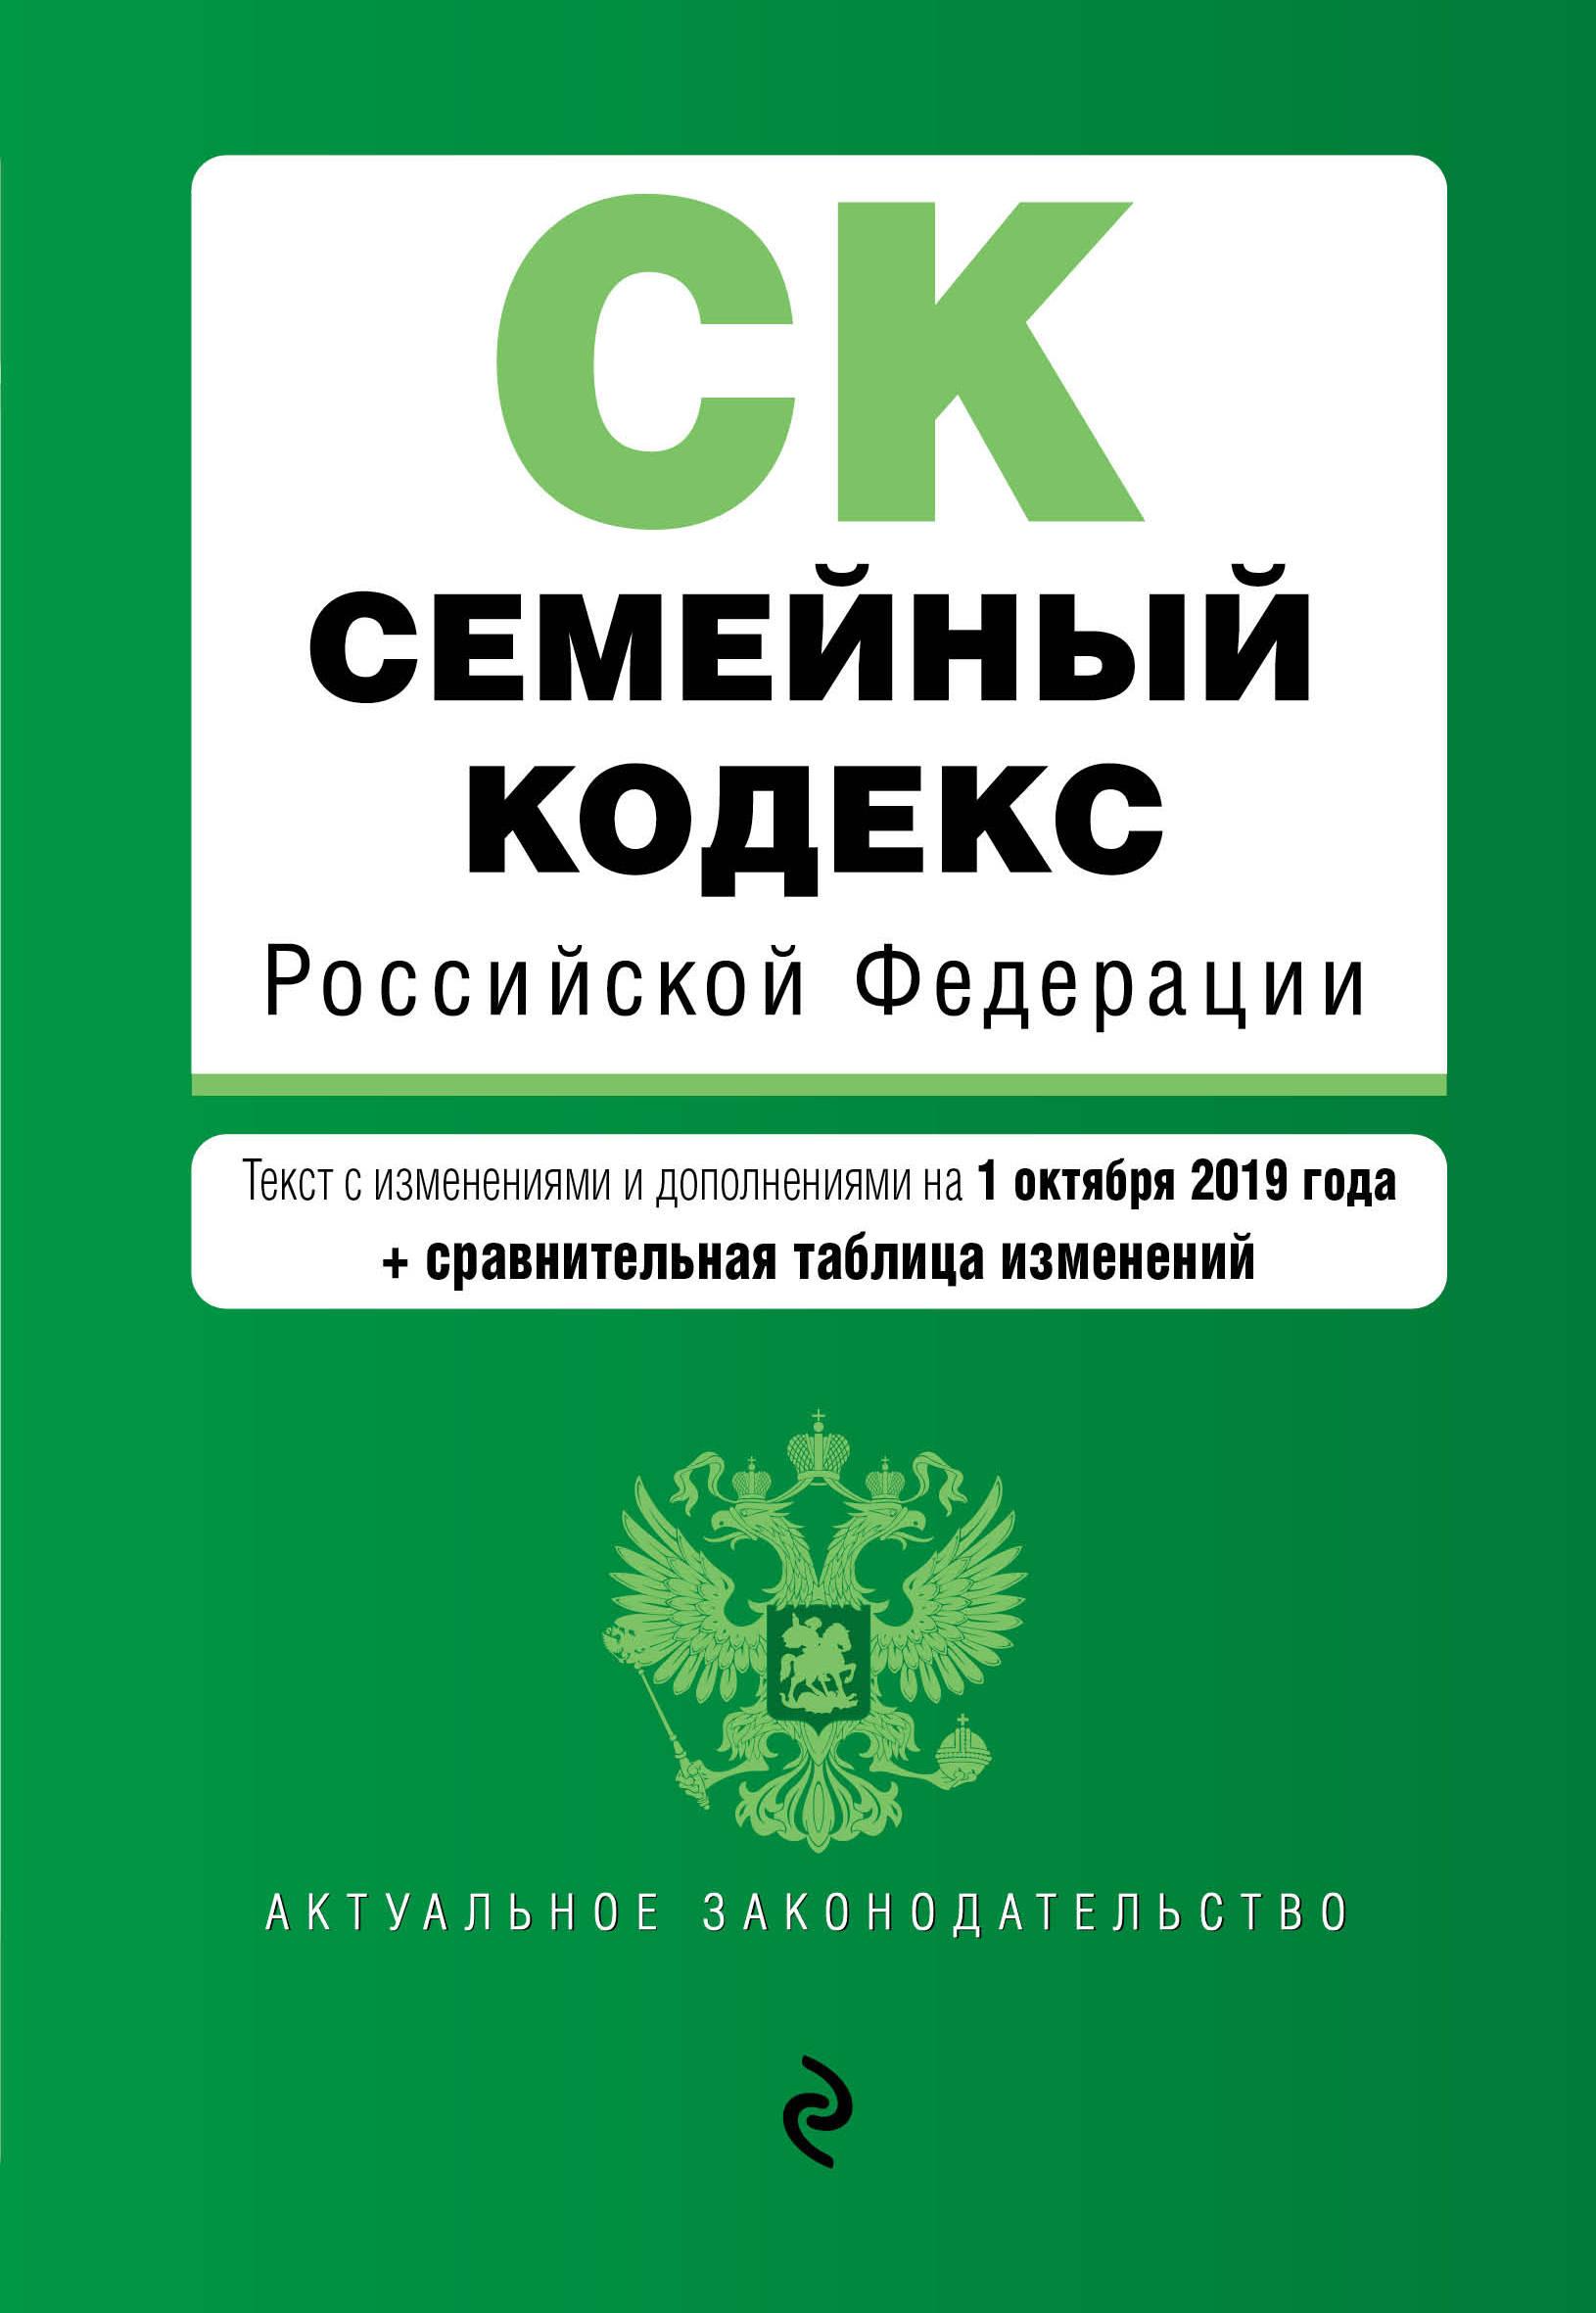 Semejnyj kodeks Rossijskoj Federatsii. Tekst s izm. i dop. na 1 oktjabrja 2019 goda (+ sravnitelnaja tablitsa izmenenij)